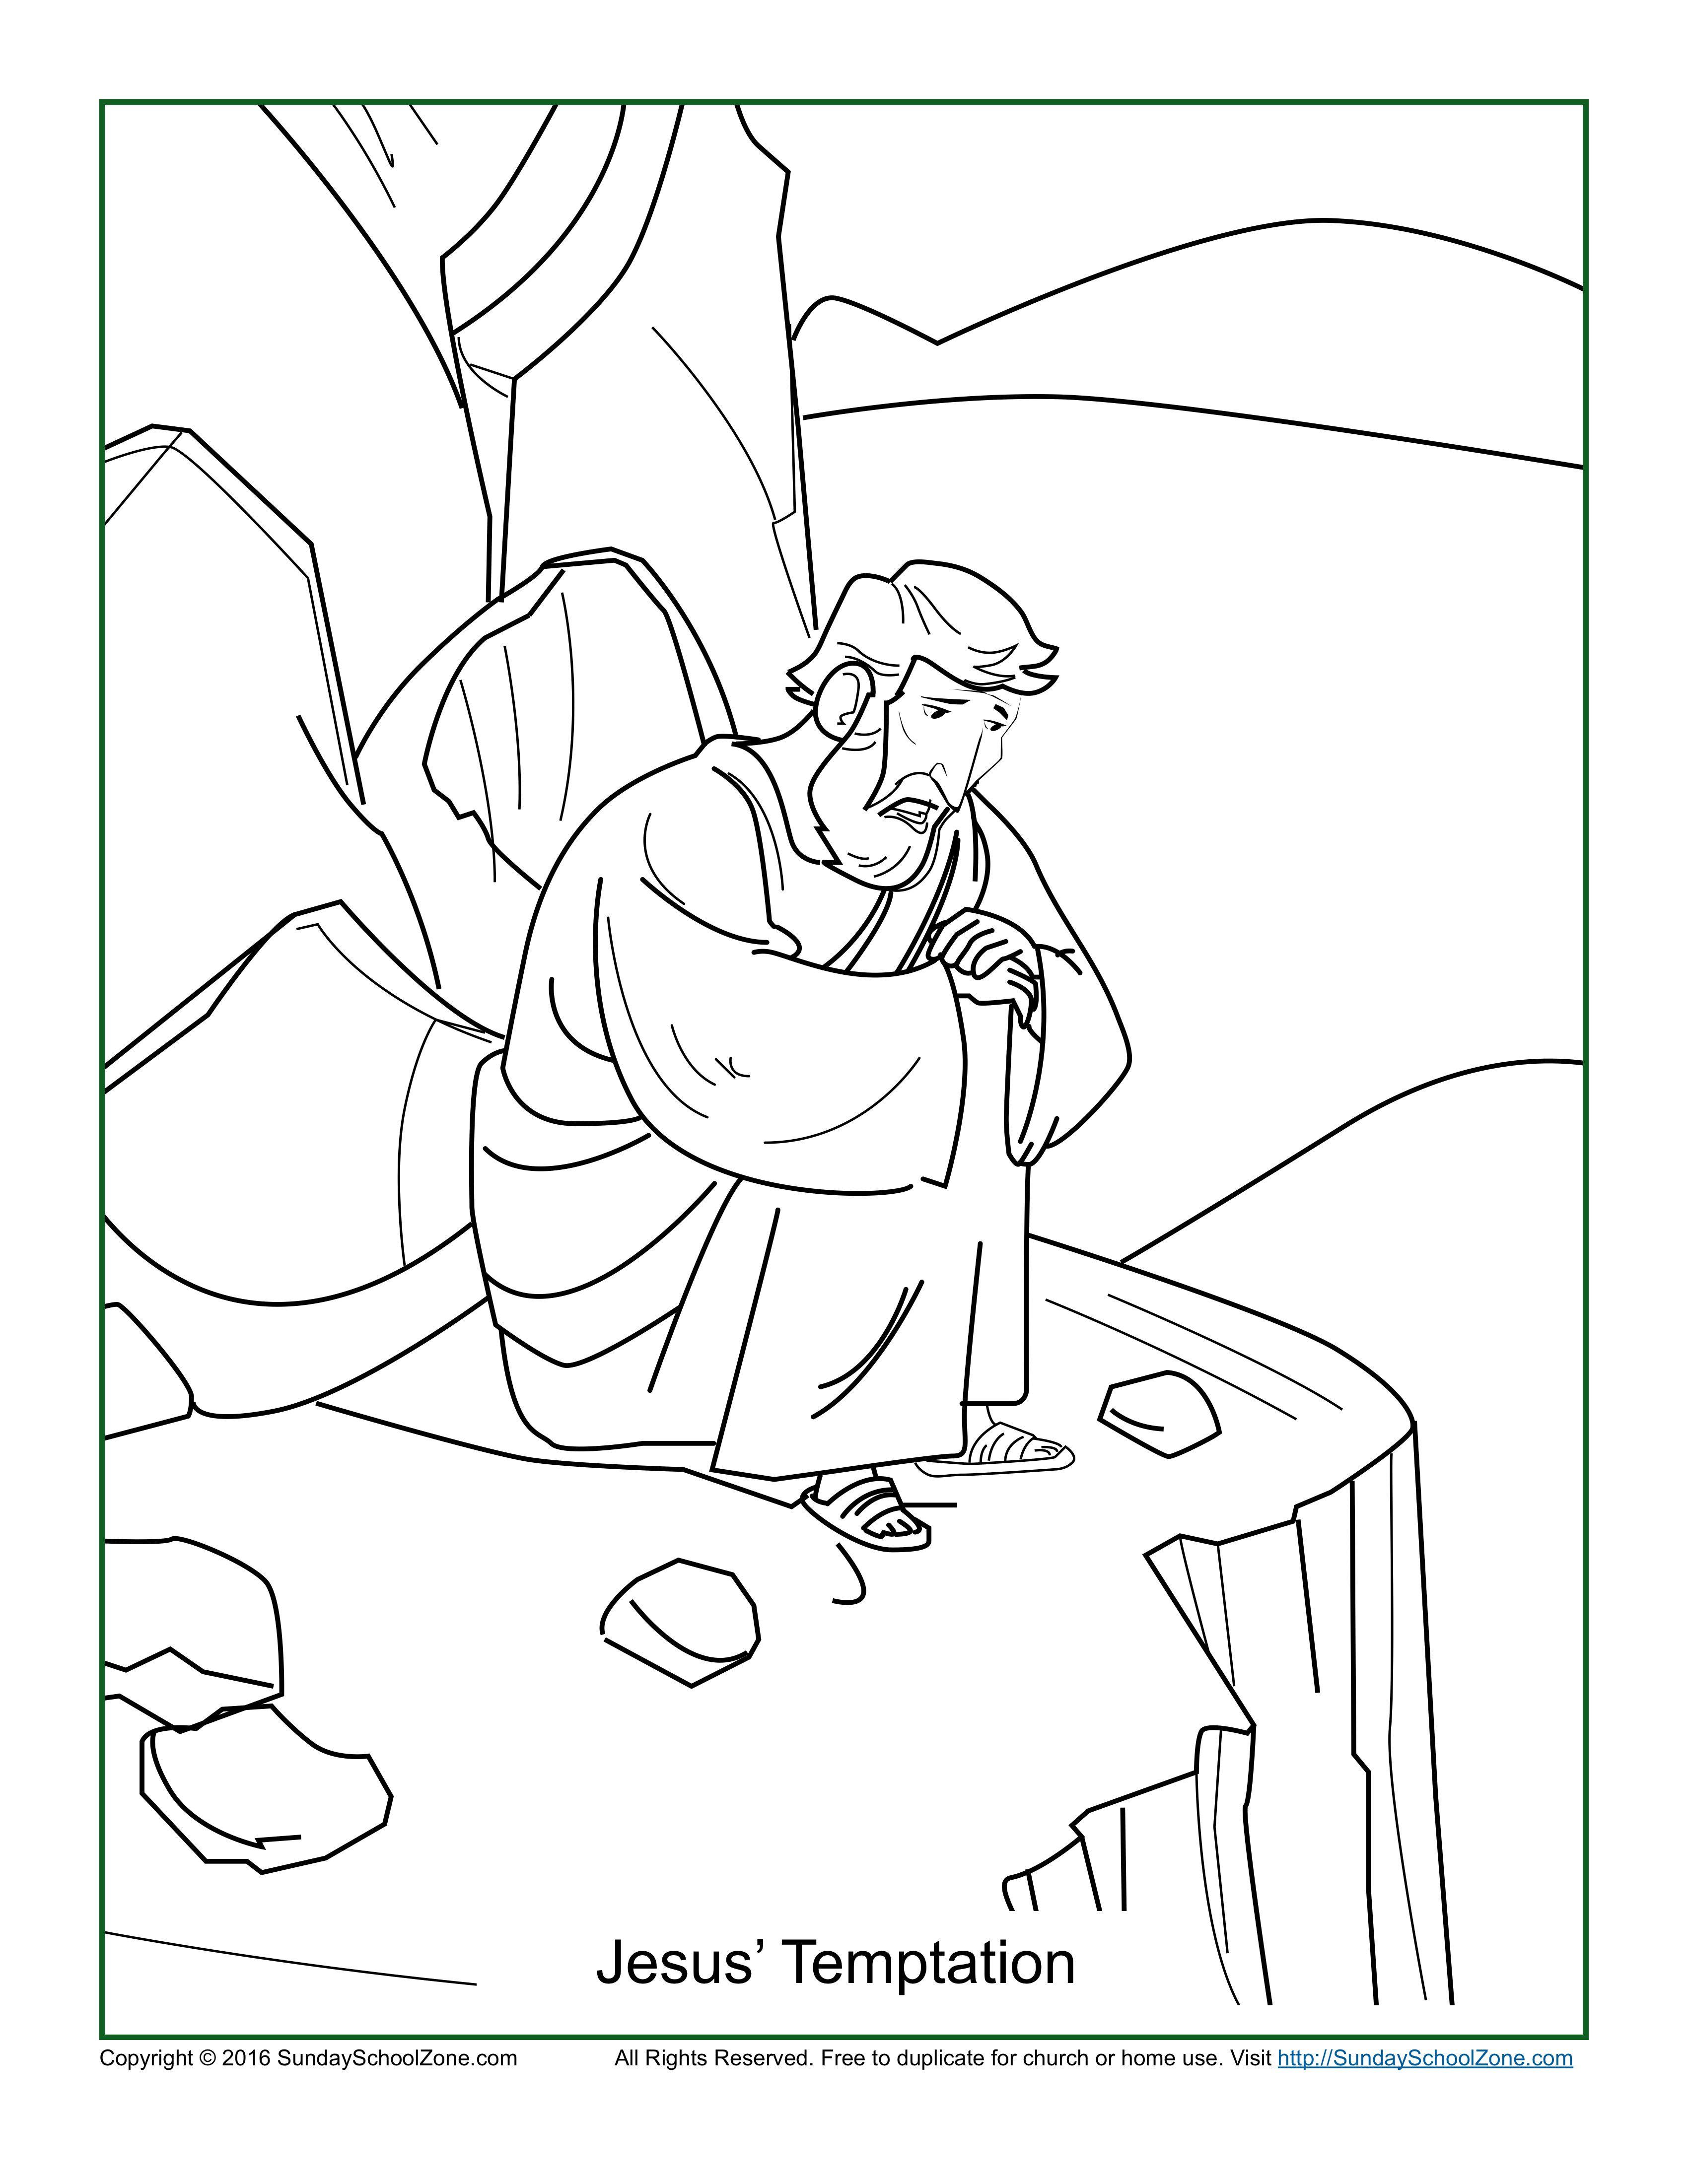 Jesus Temptation Coloring Page Pages  Jesus coloring pages